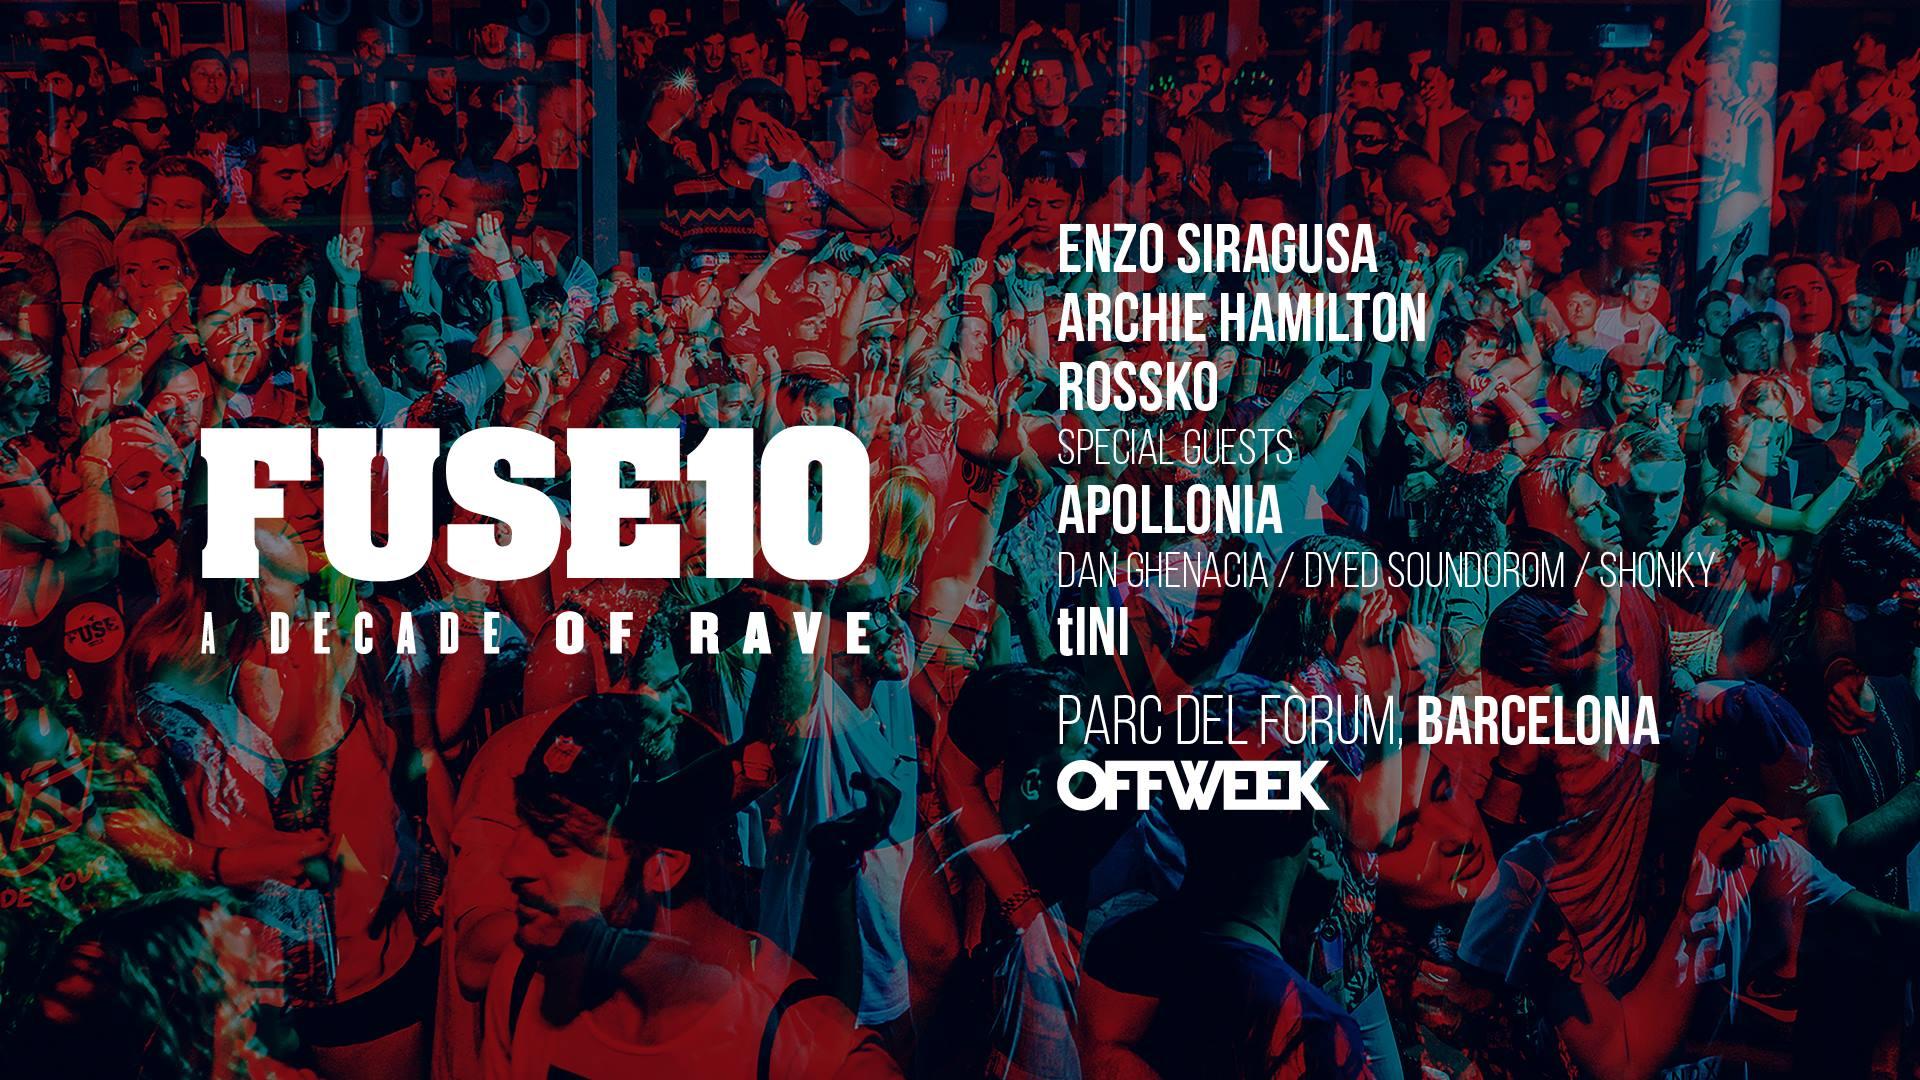 Off Week Festival 2019 - Fuse10